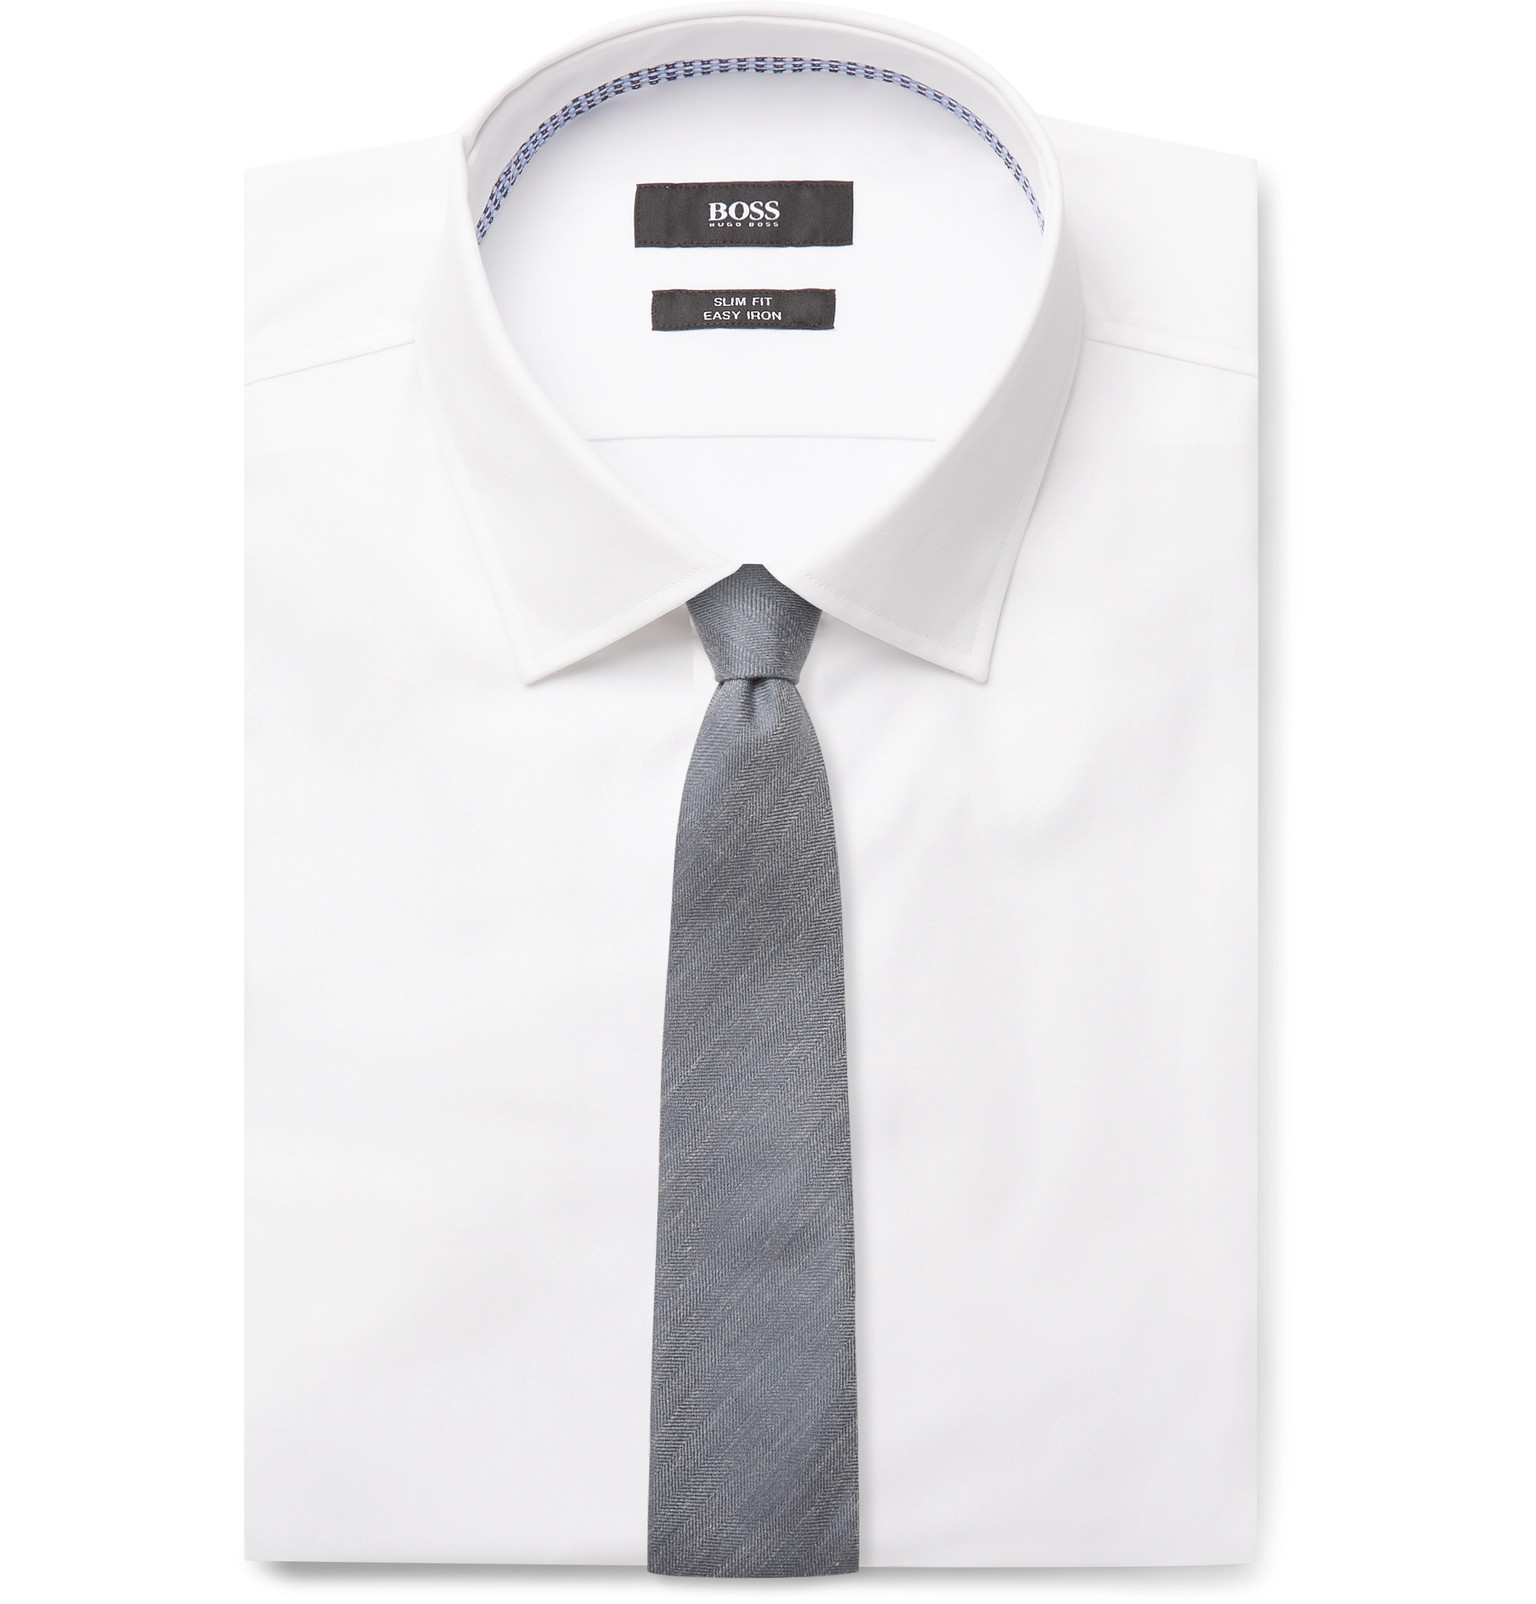 6a7dad4c5 Hugo Boss - White Jesse Slim-Fit Cotton-Poplin Shirt